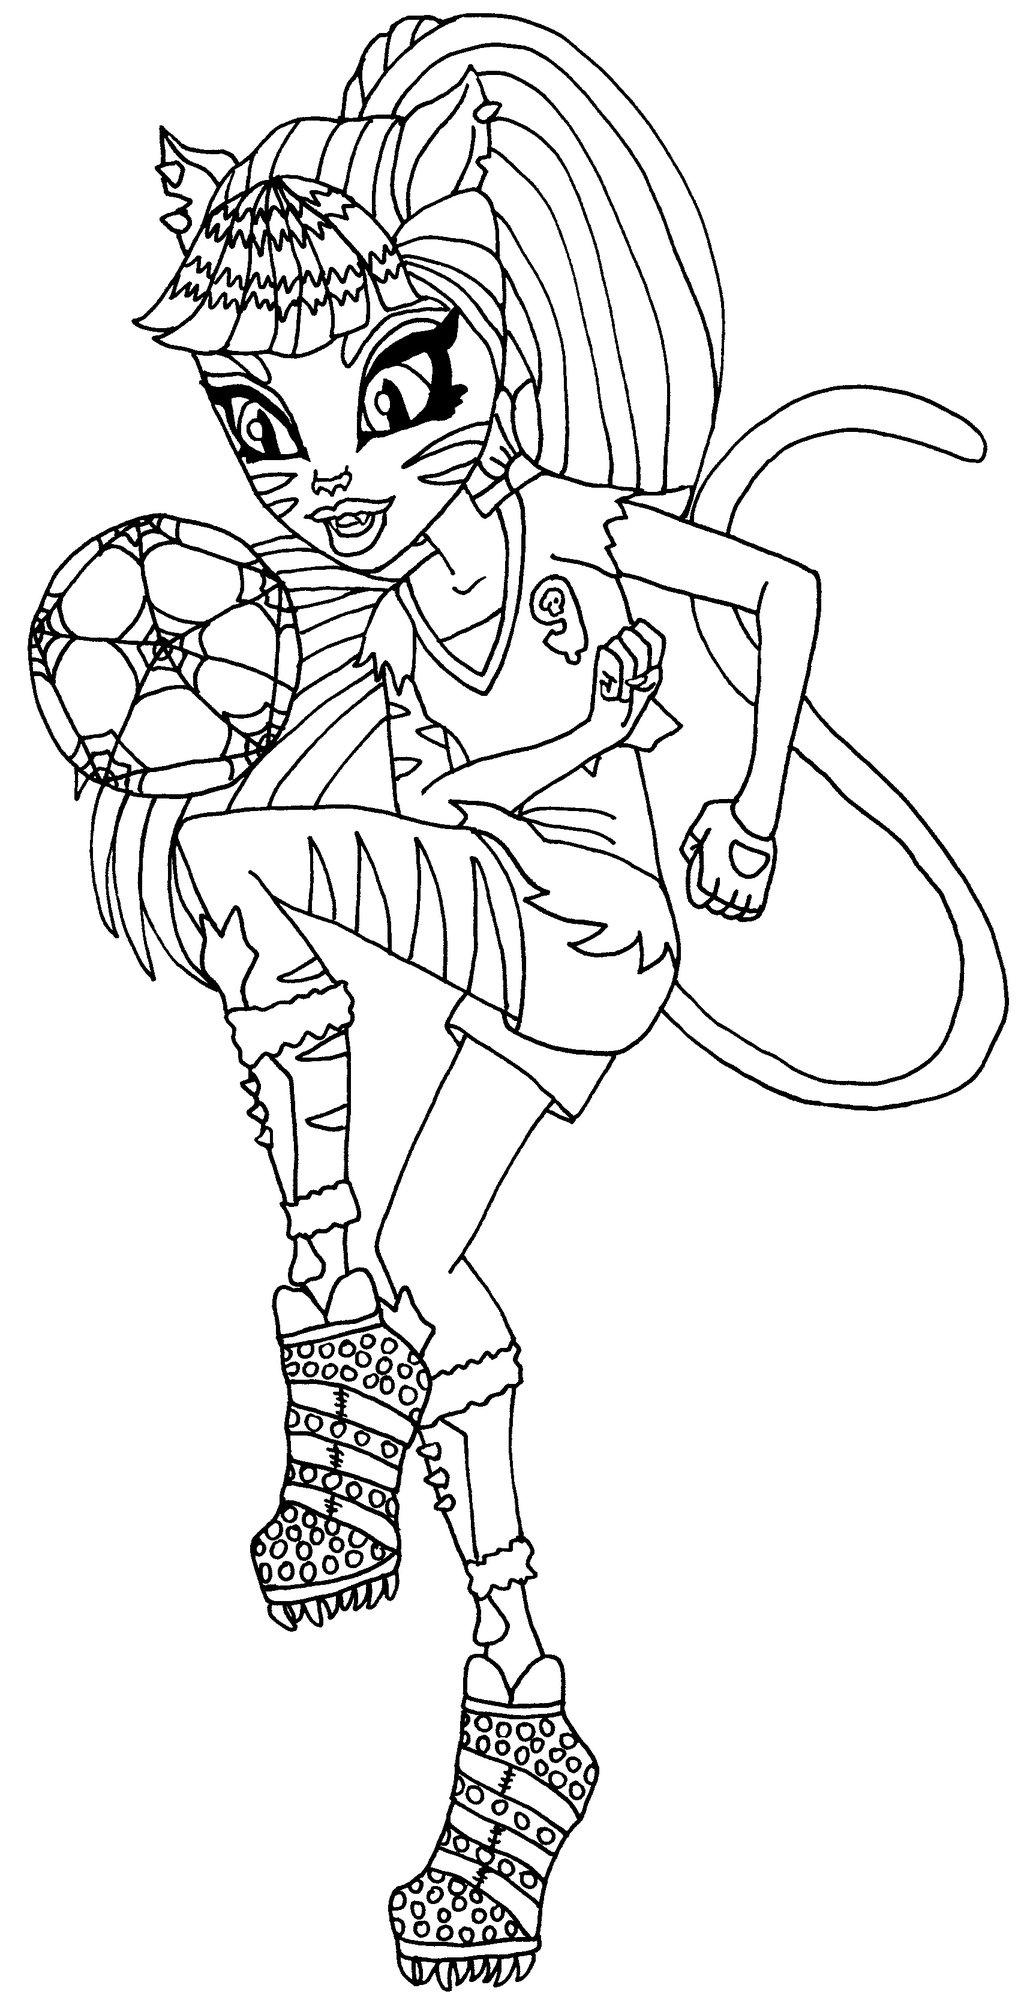 Coloriage Monster High Toralei À Imprimer destiné Image Monster High A Imprimer